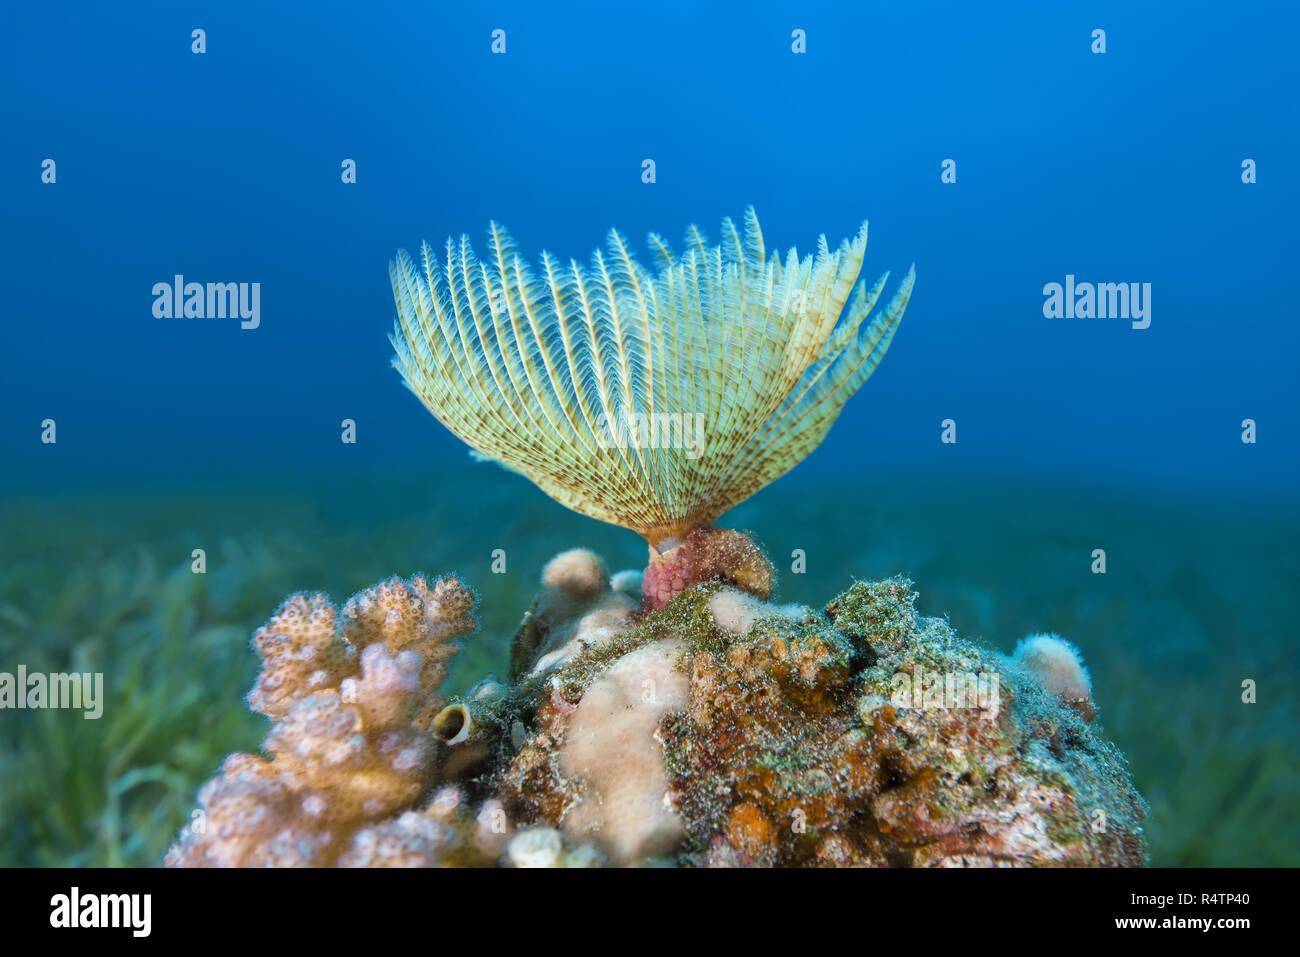 Indian Feather Duster Worm (Sabellastarte spectabilis), Red Sea, Dahab, Egypt - Stock Image